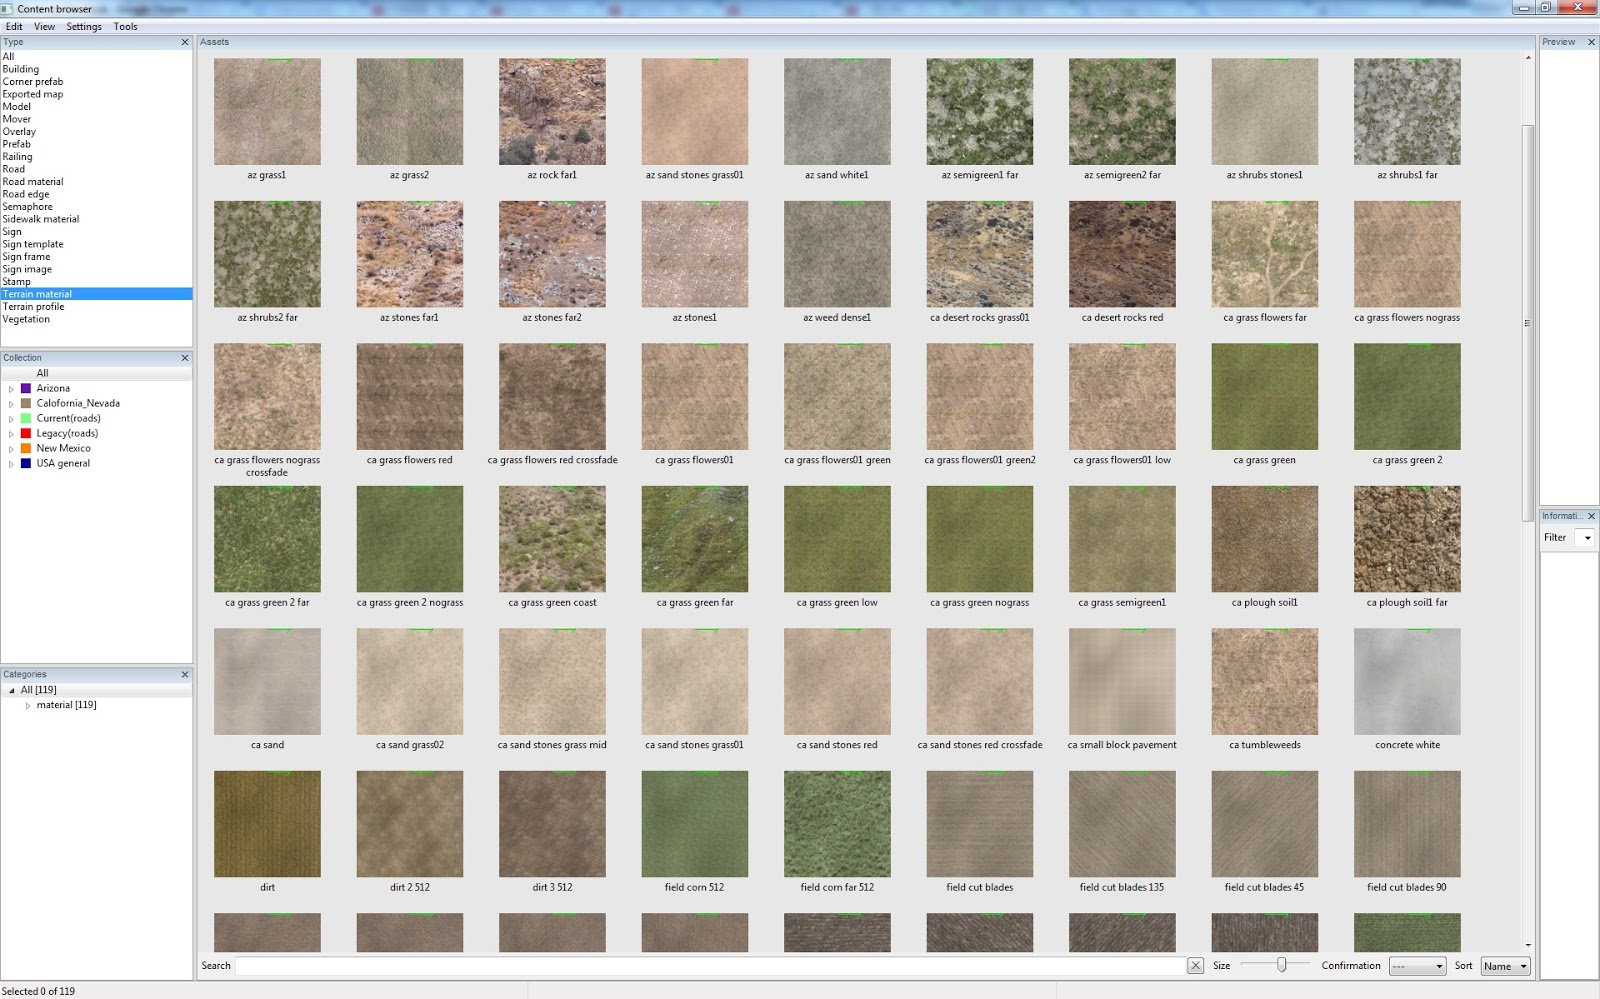 Terrain+textures+in+editor.jpg